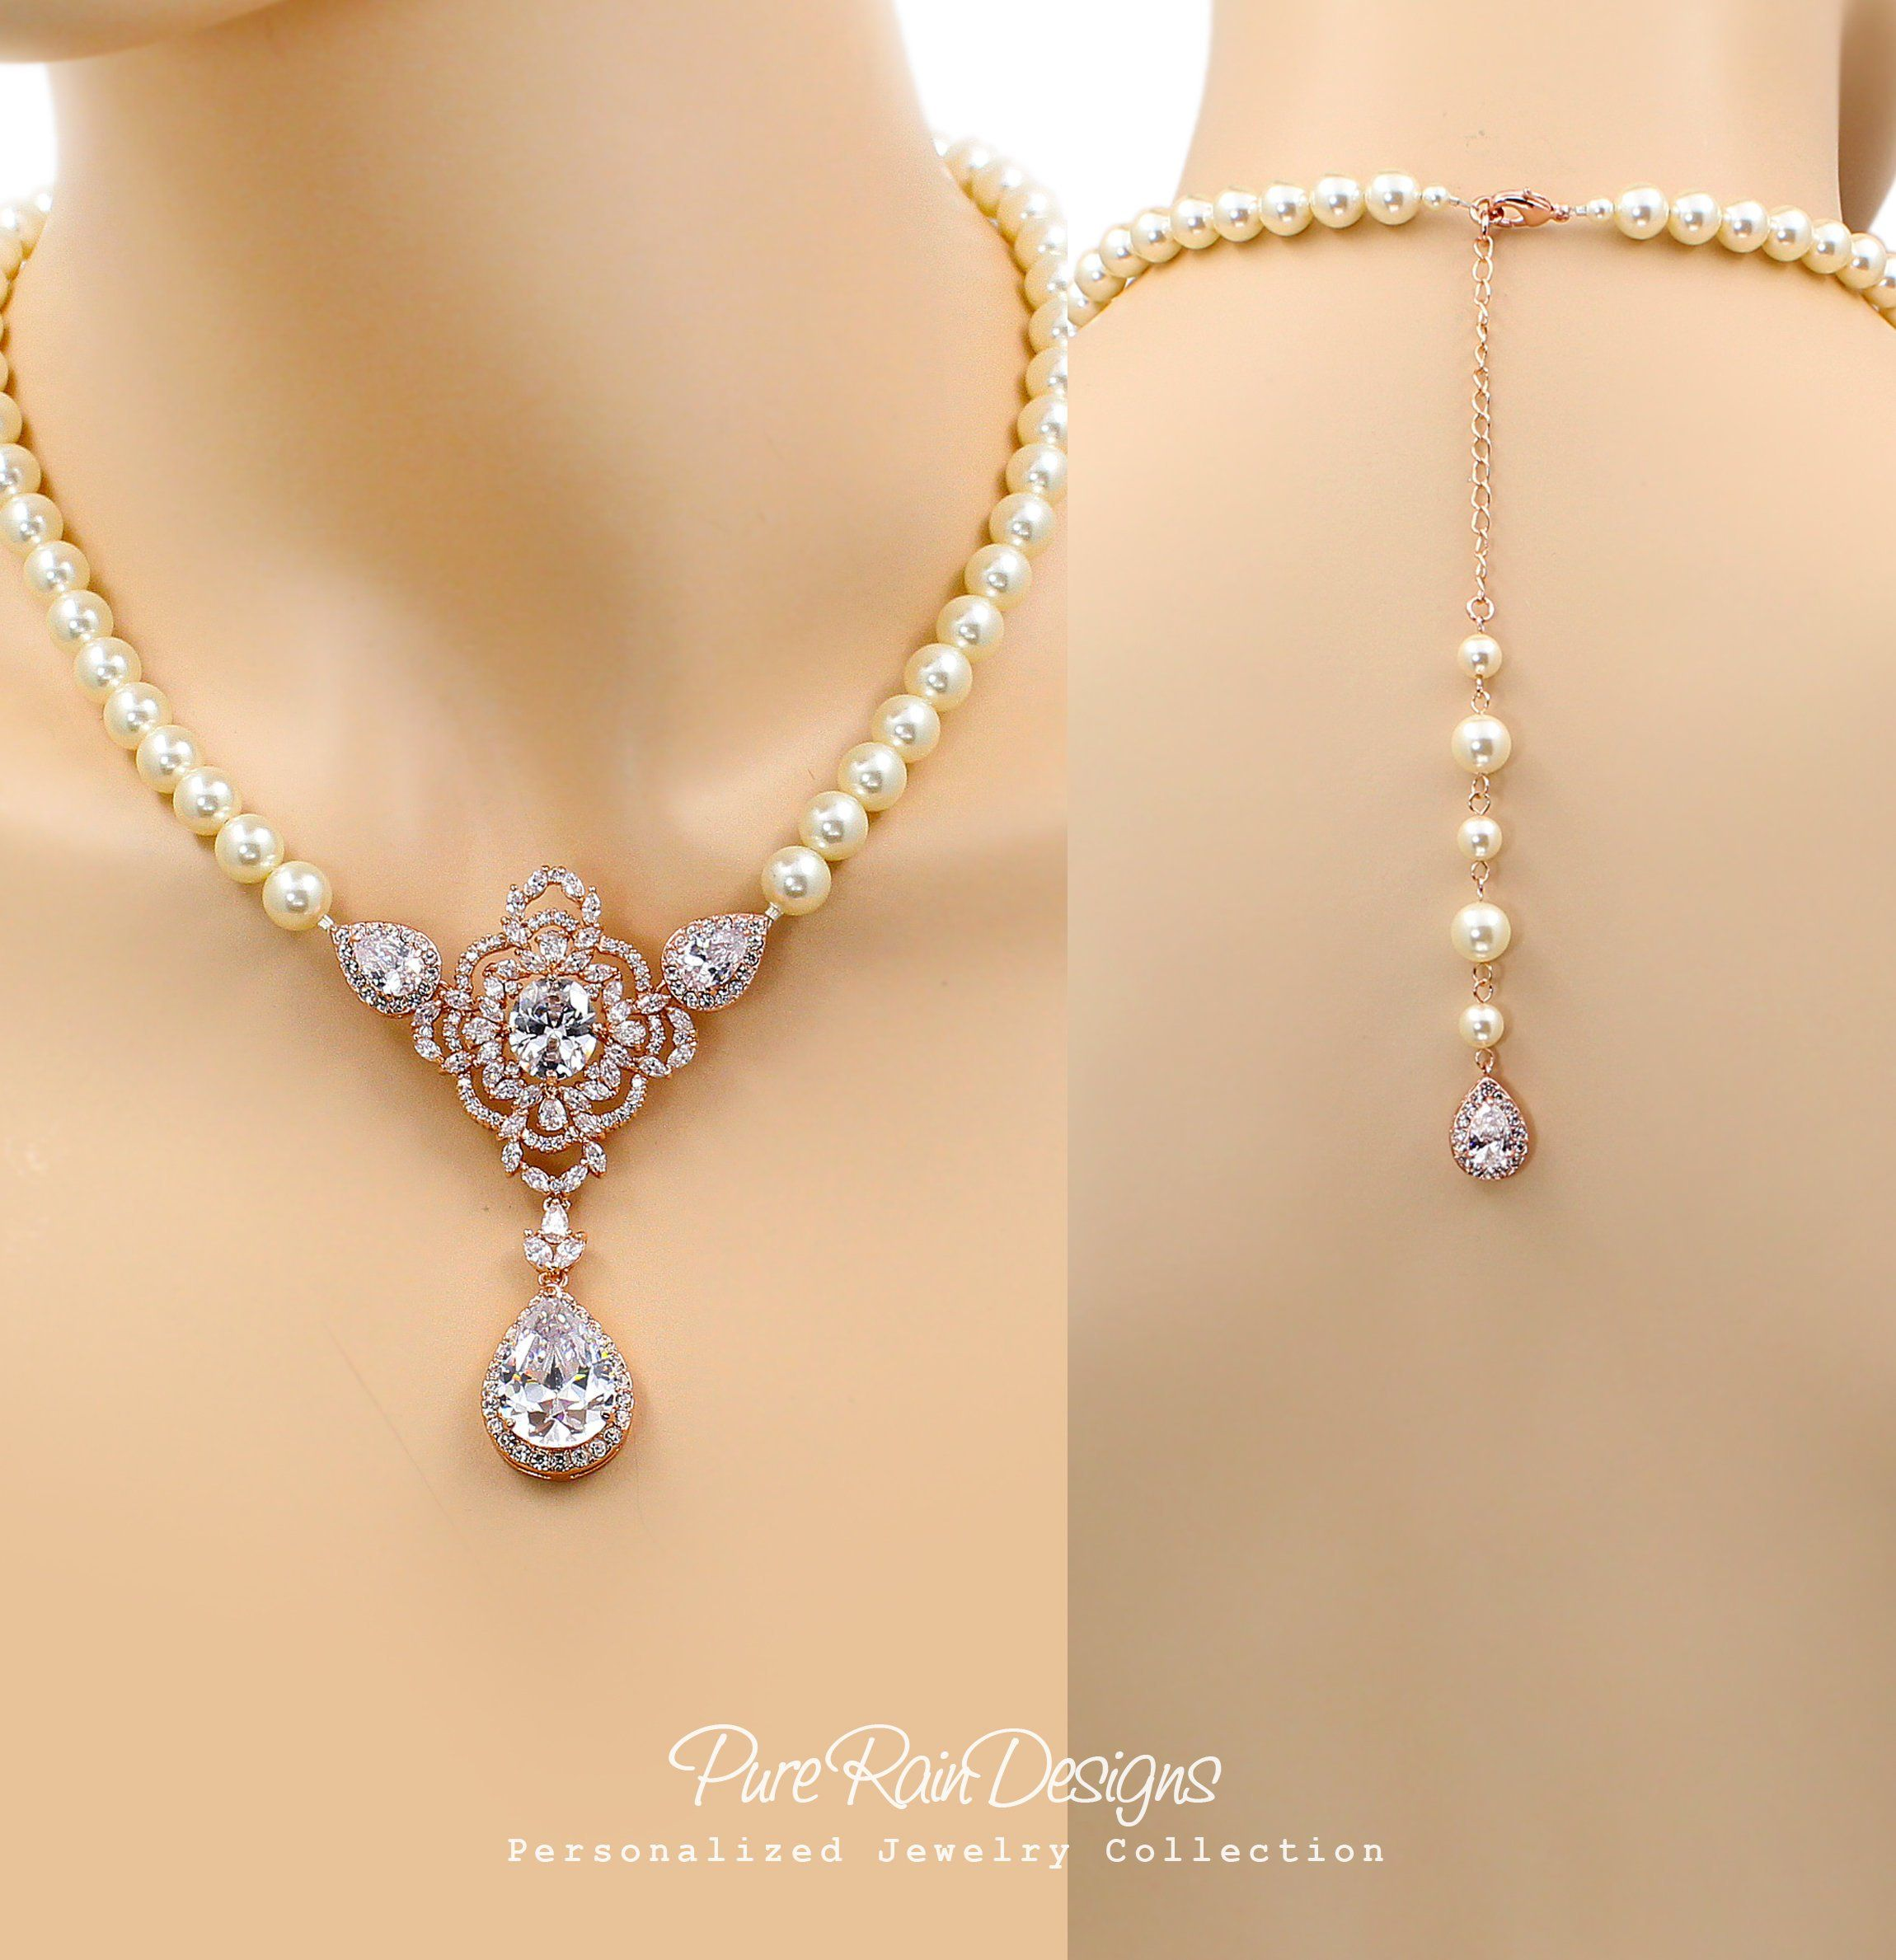 Wedding Necklace Earrings set Zirconia Rhinestone Backdrop Necklace Earrings set Wedding Jewelry set Wedding Accessory Bridal Jewelry Pazu